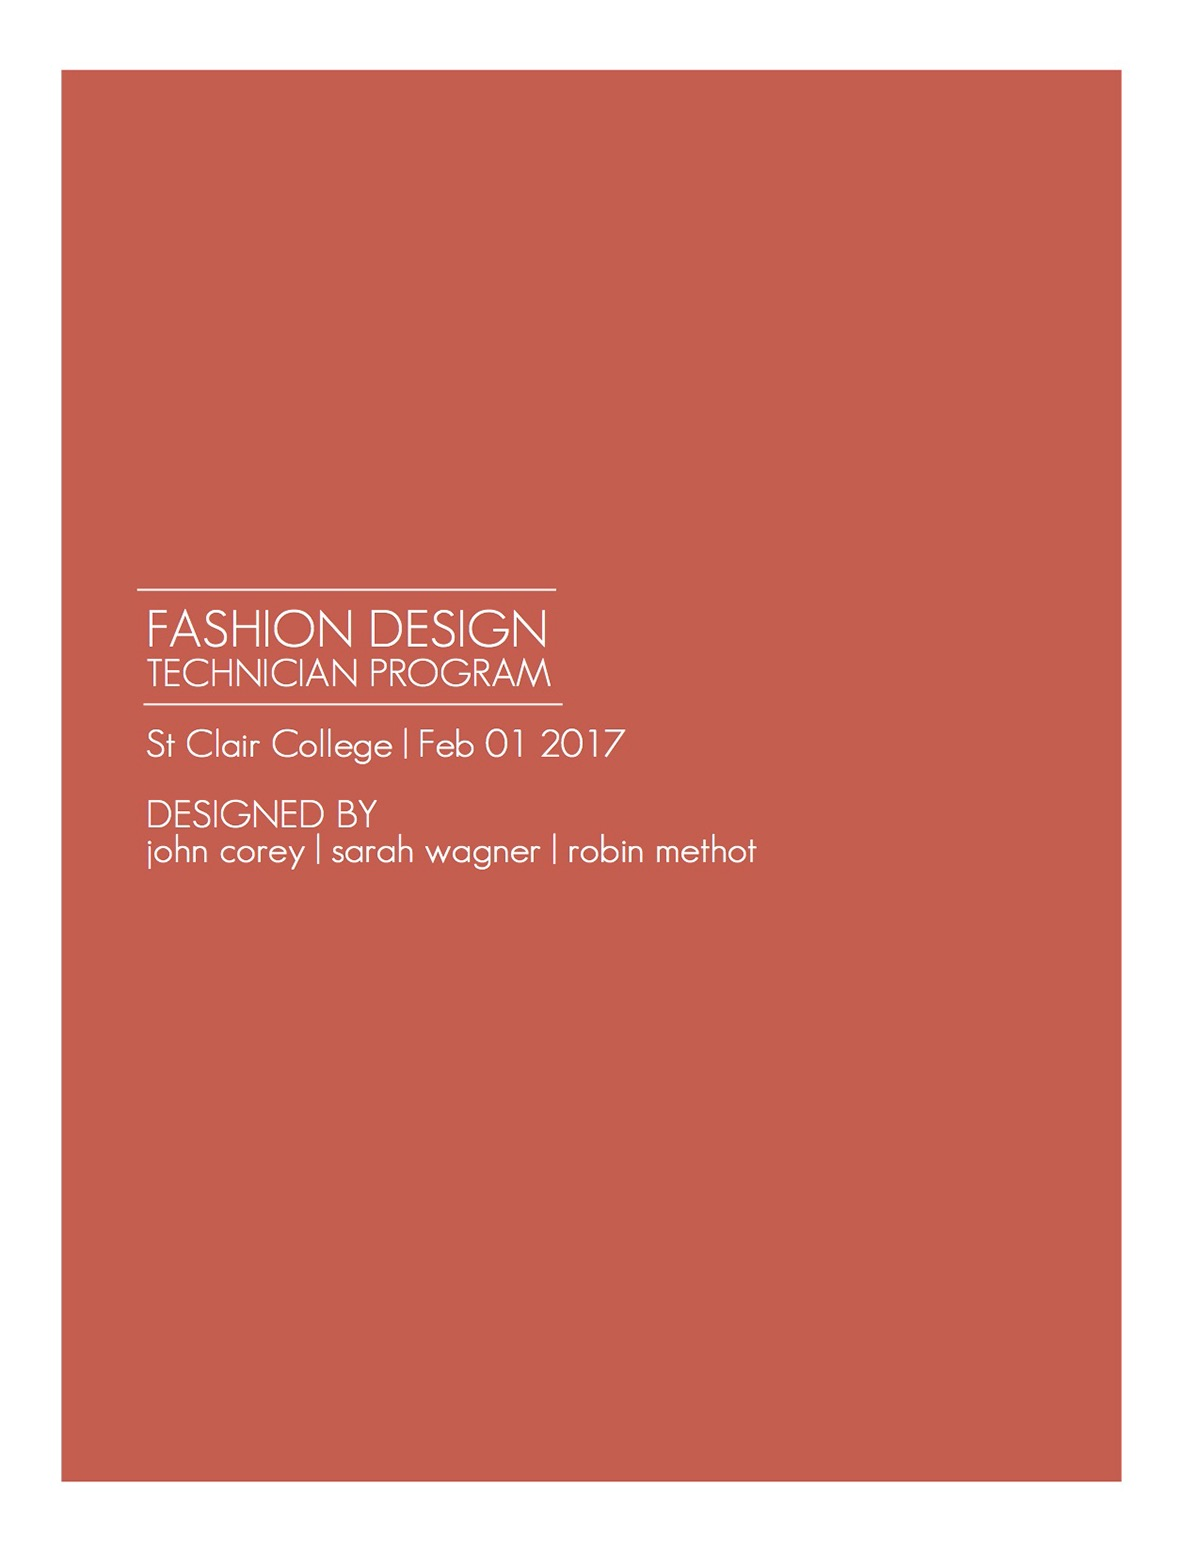 St Clair College Atelier Fashion Design Branding On Behance